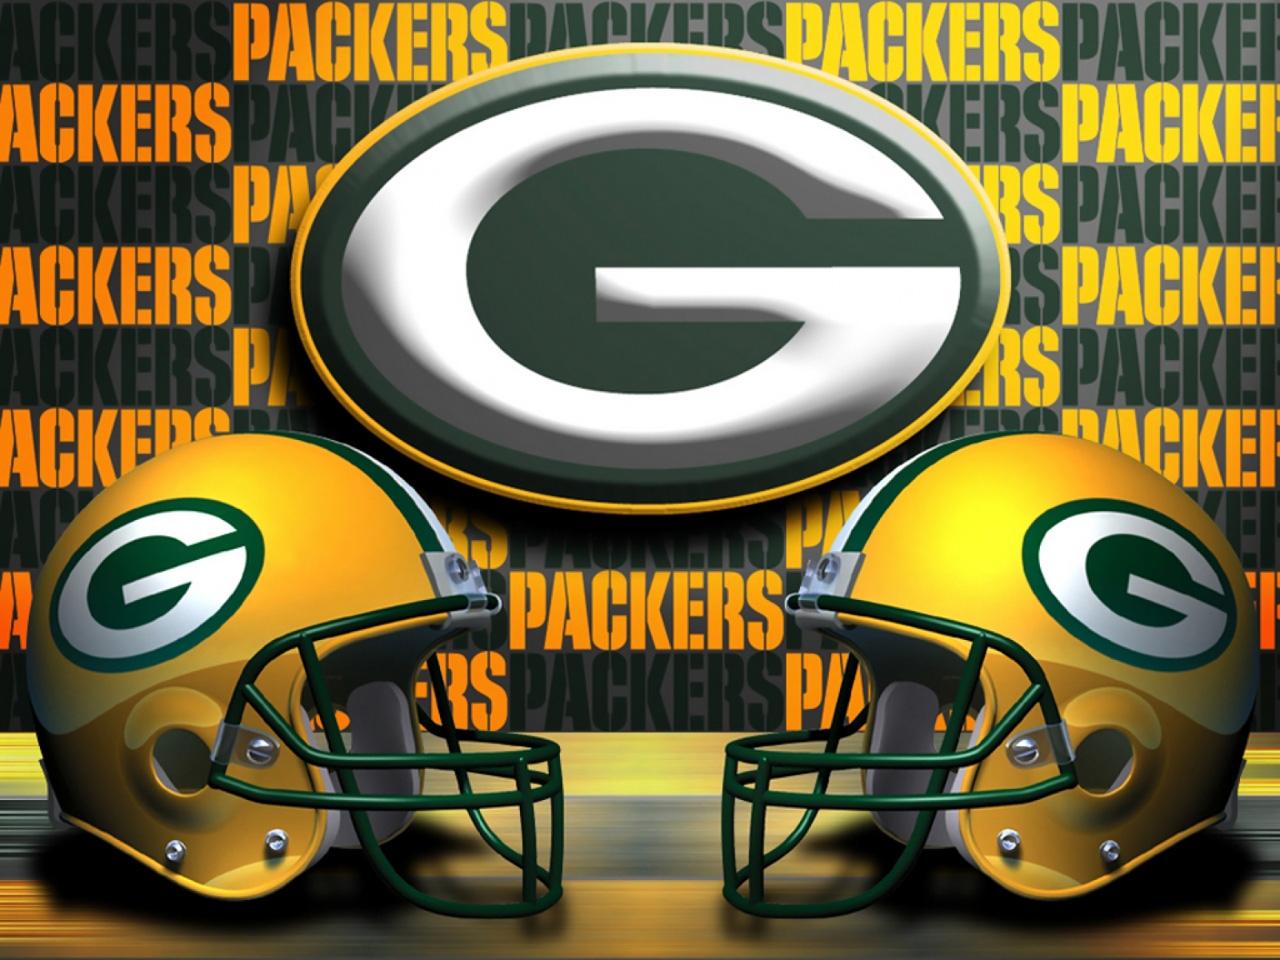 Green Bay Packers Iphone X Wallpaper Preseason Oakland Raiders Vs Green Bay Packers